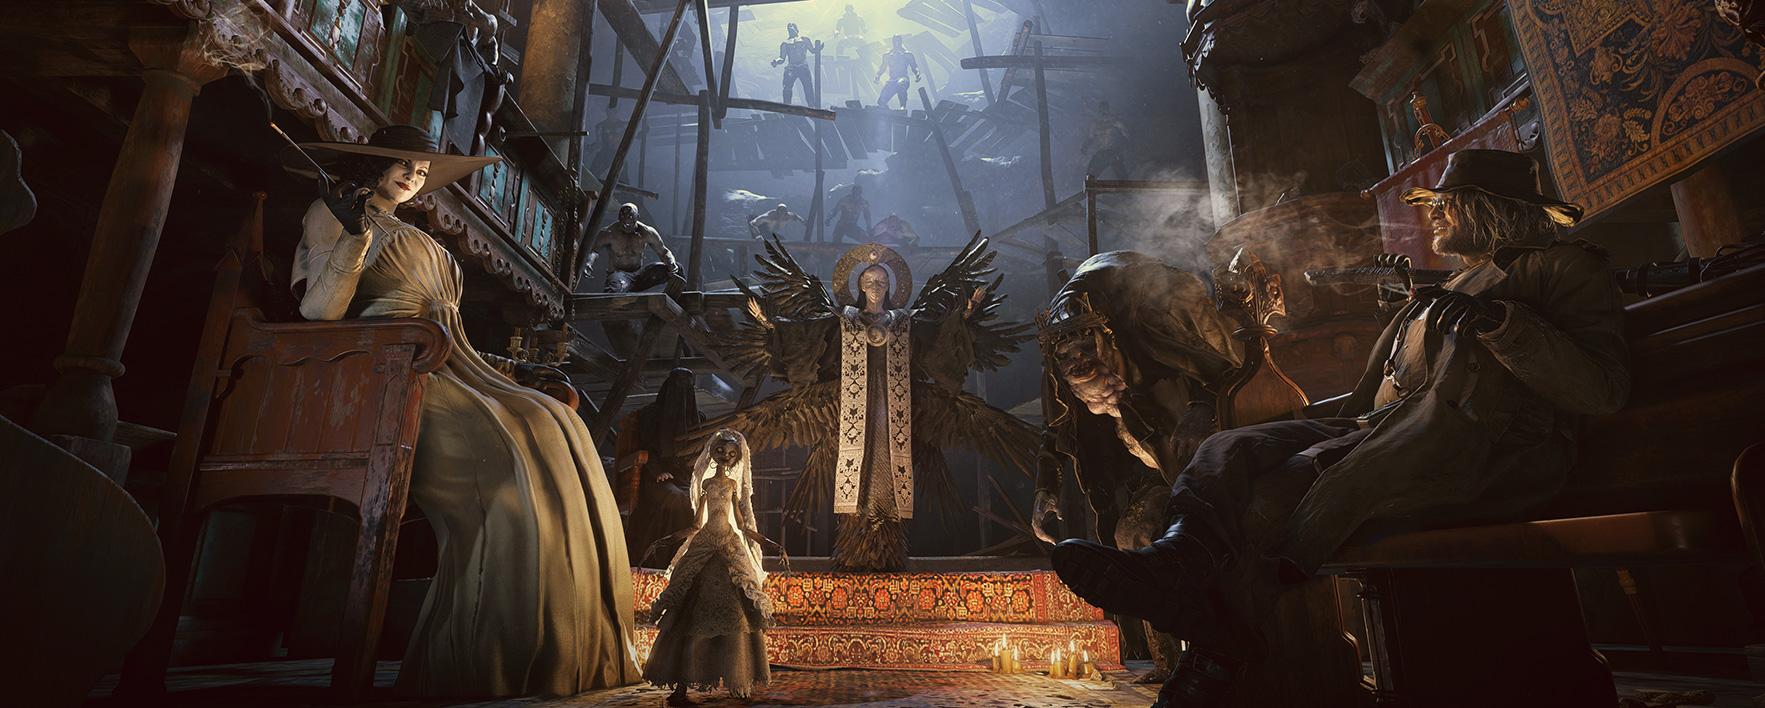 Name:  Resident Evil 8  (1).jpeg Views: 1803 Size:  470.5 KB